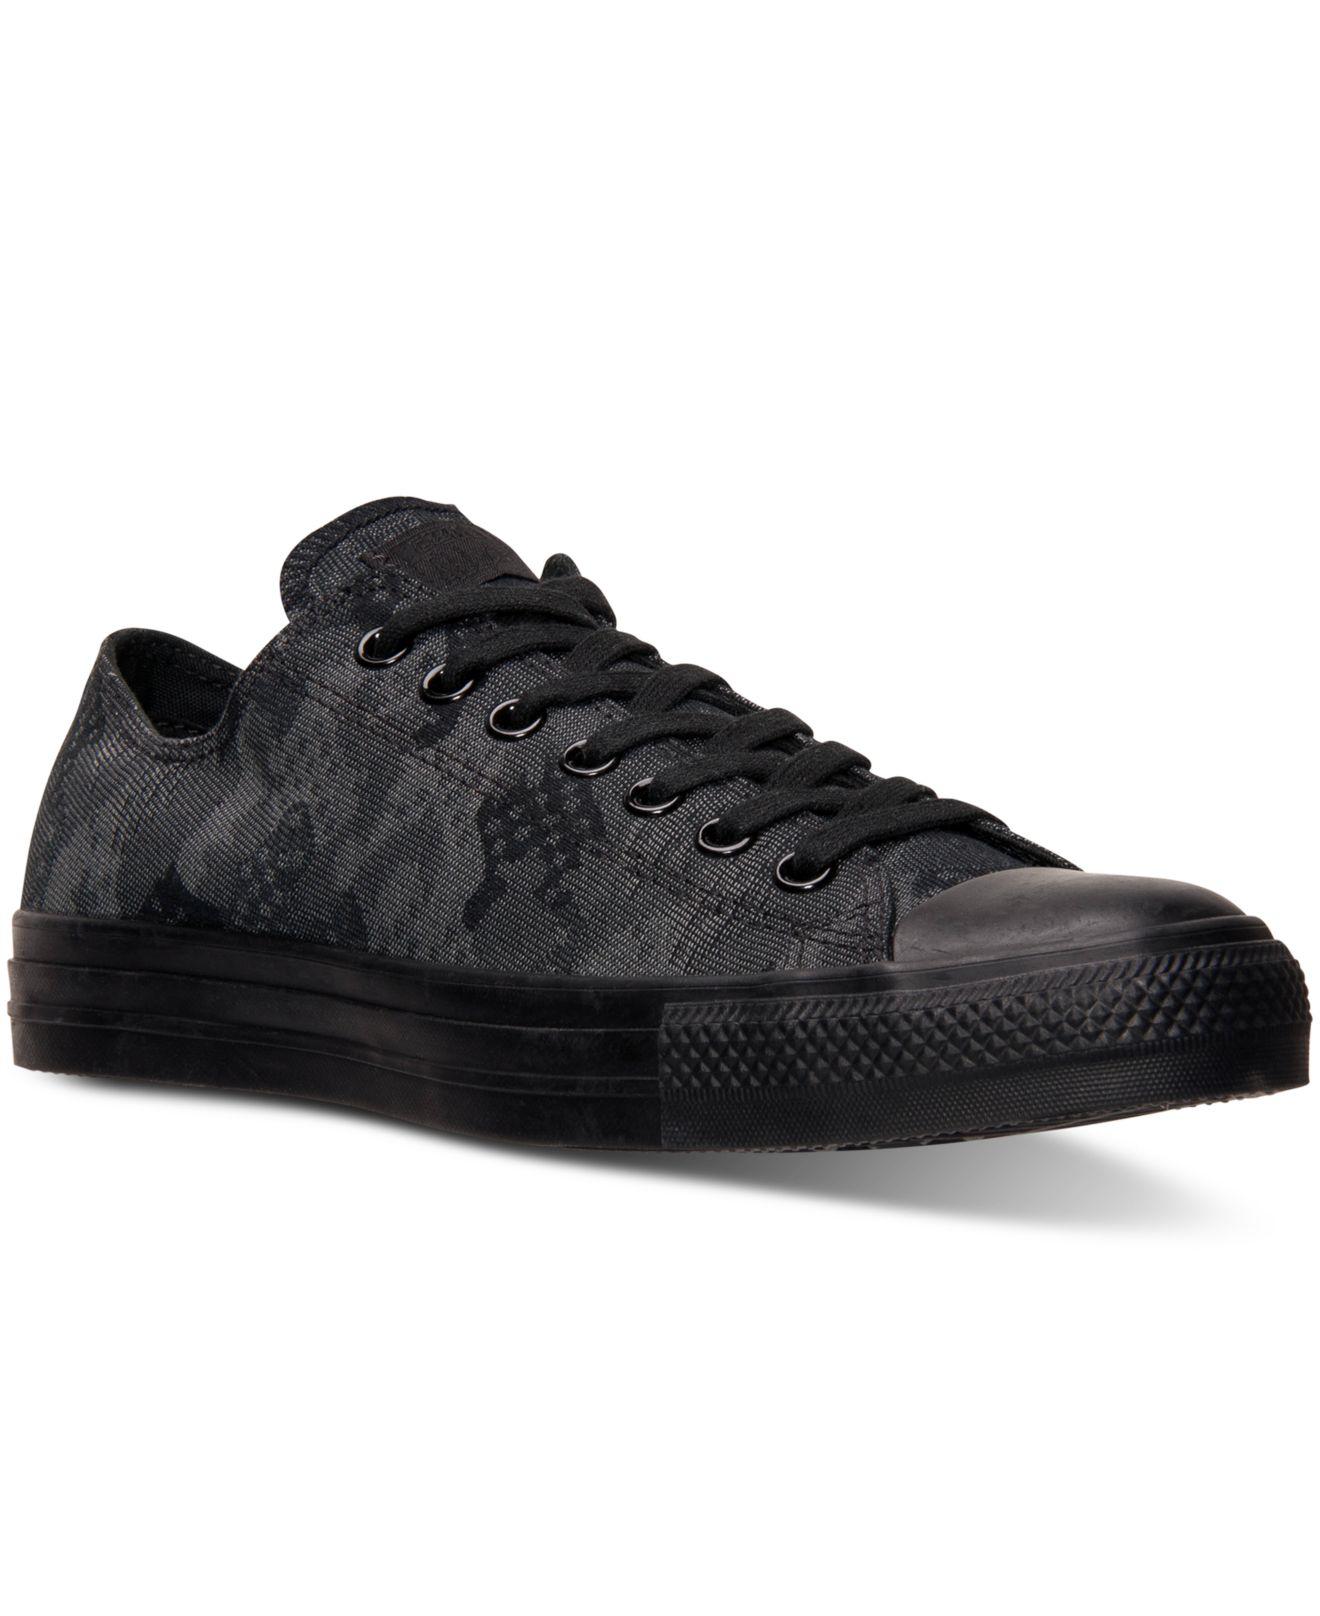 3739d6e40843 Lyst - Converse Men s Chuck Taylor Ox Camo Jacquard Casual Sneakers ...